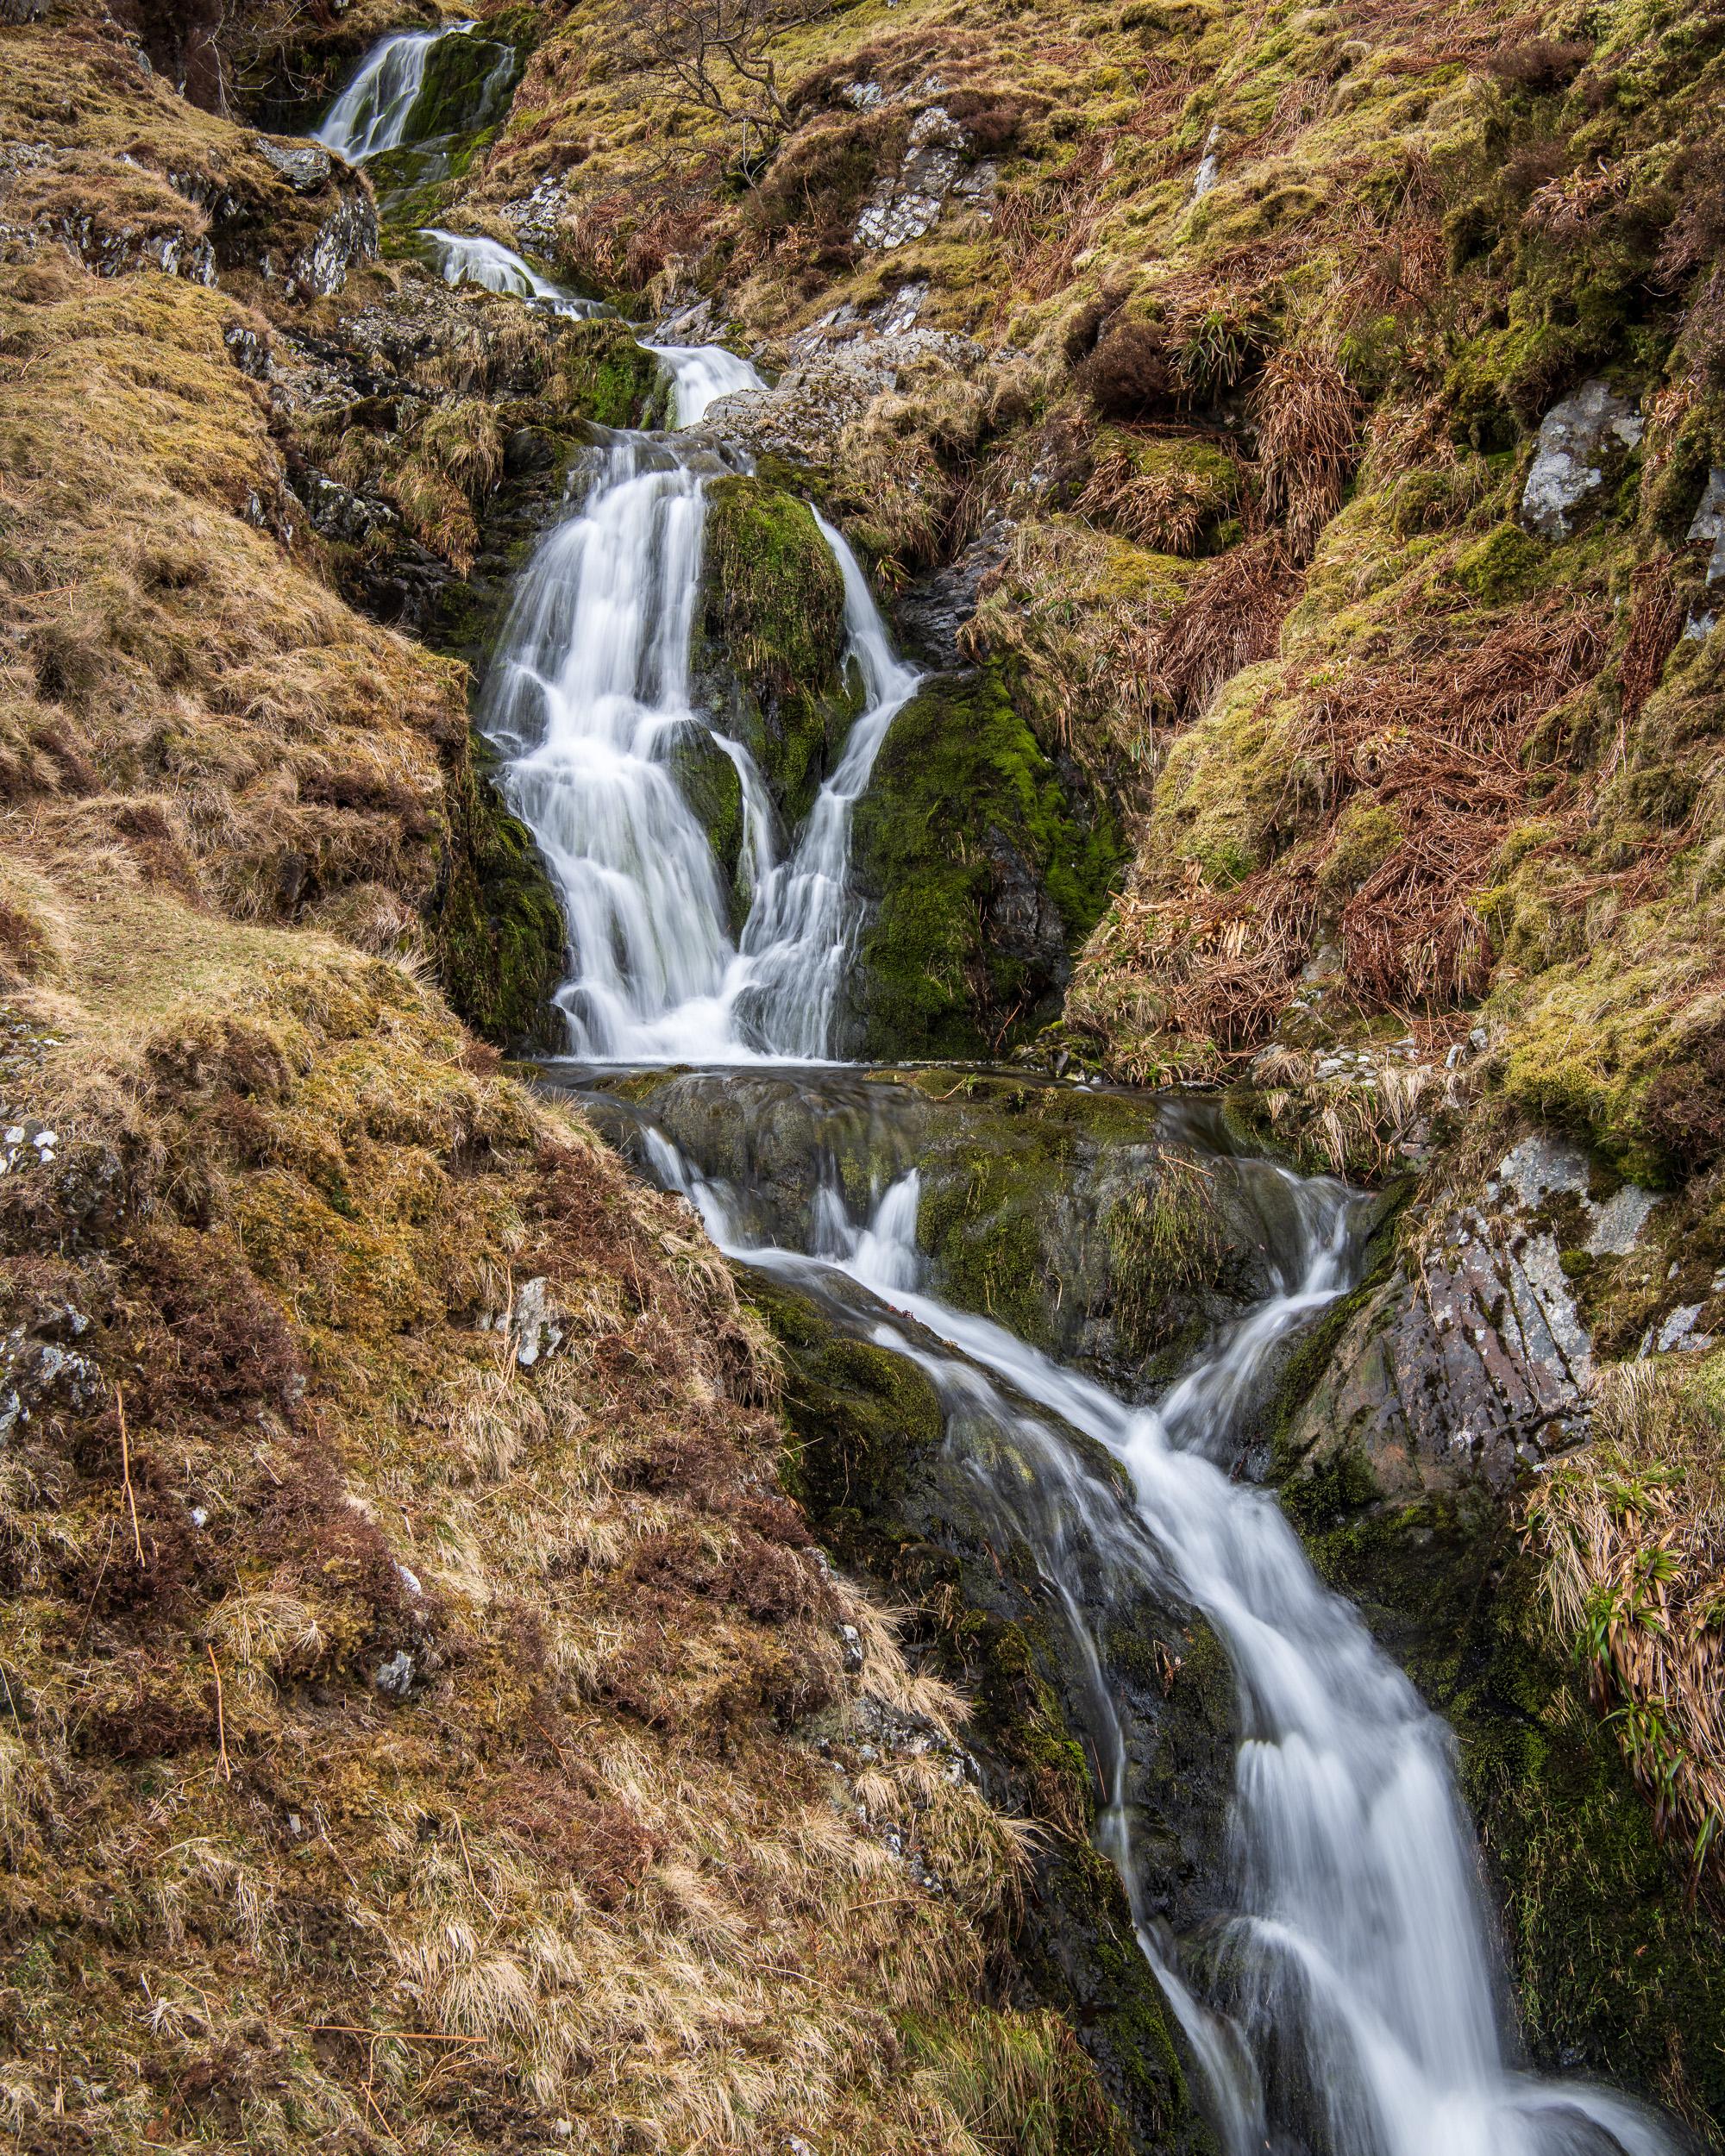 Waterfall - left hand side